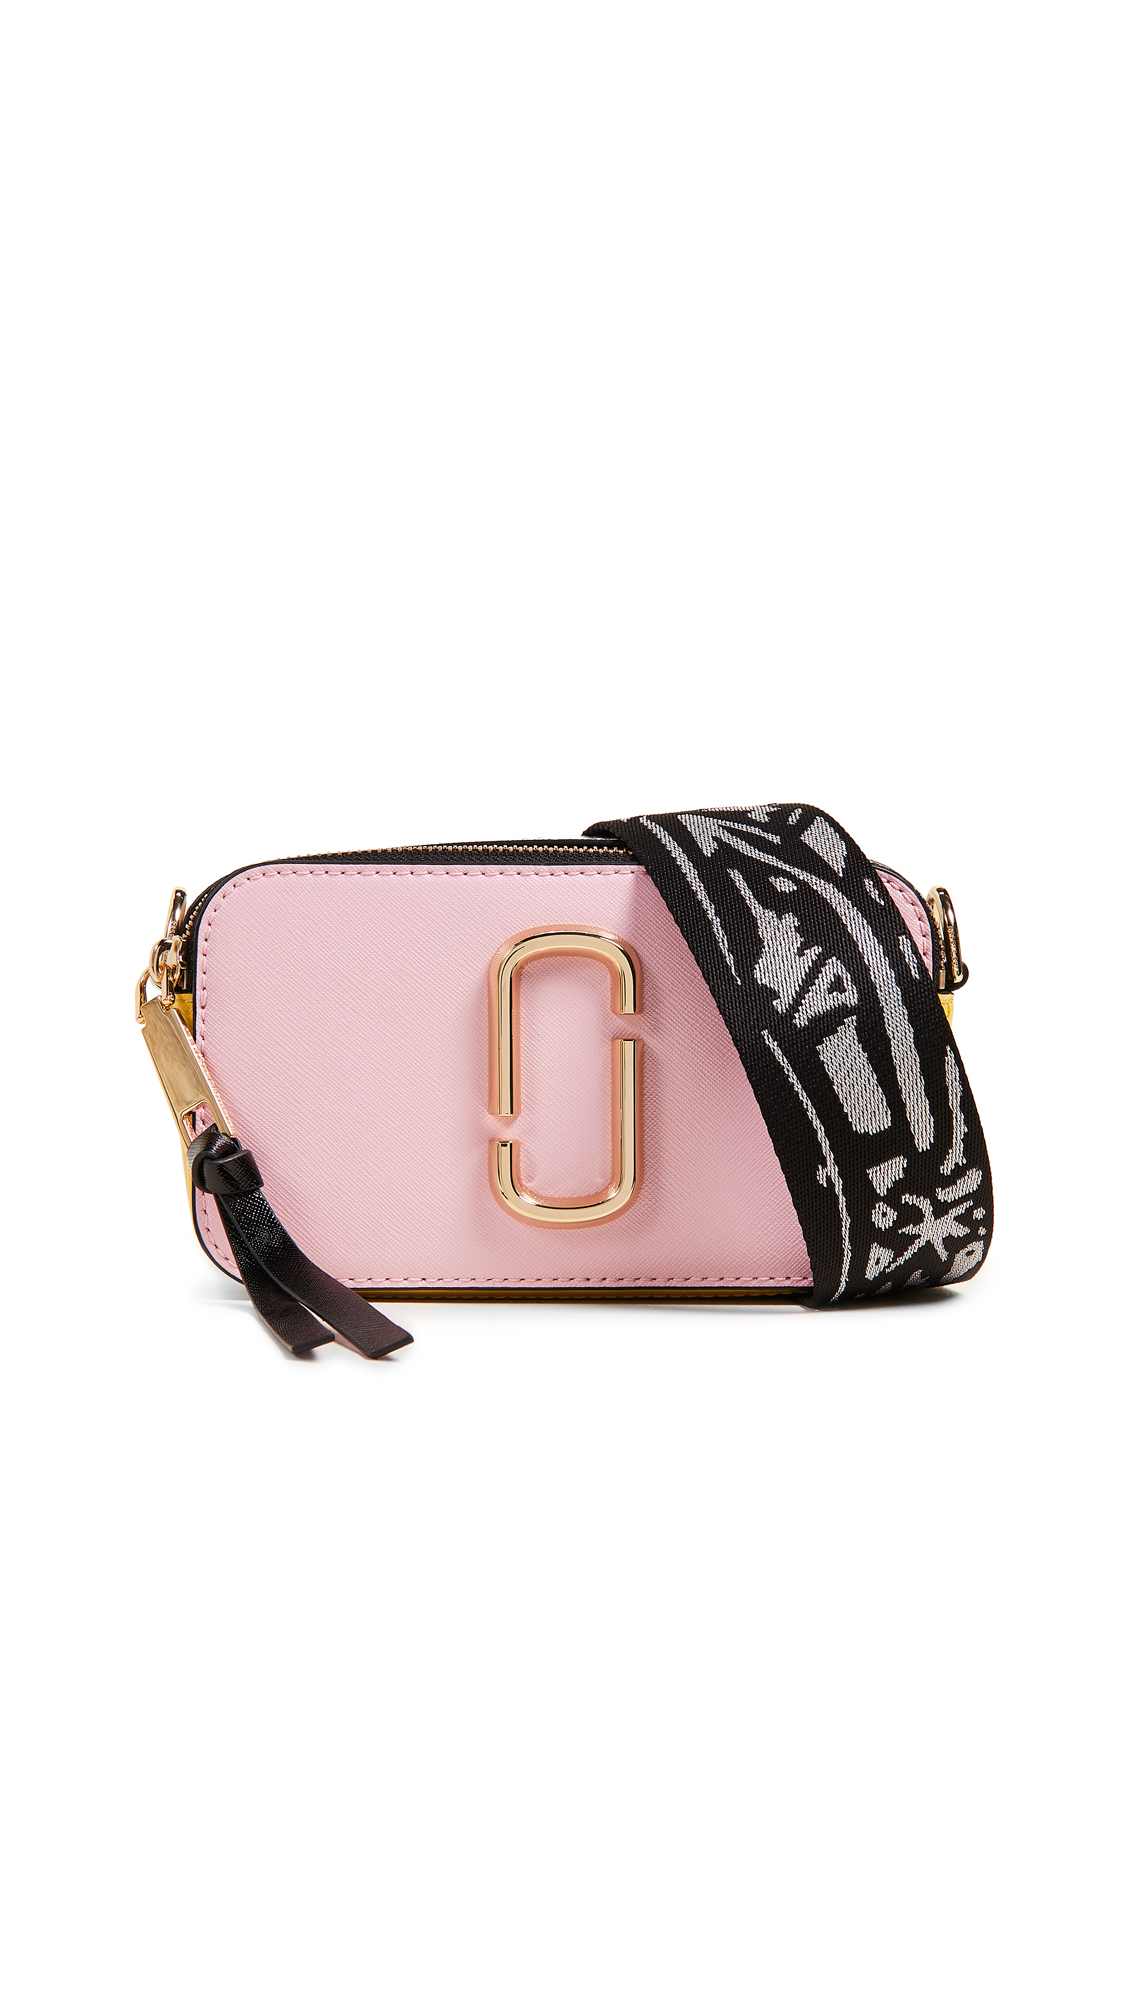 Marc Jacobs Snapshot Camera Bag - Baby Pink